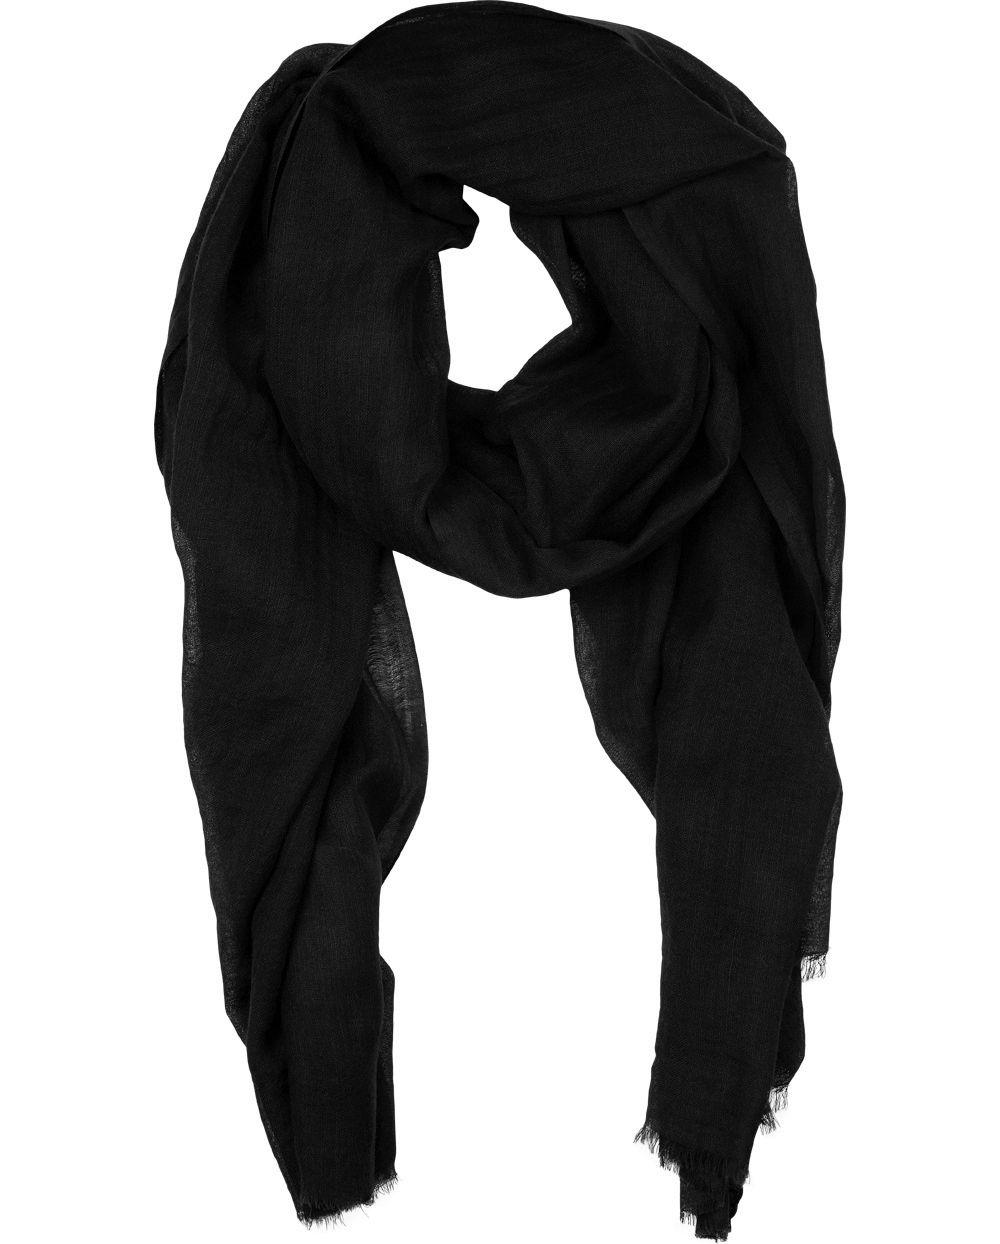 "Naledi Copenhagen ""Dark Side"" scarf - semitransparent black"